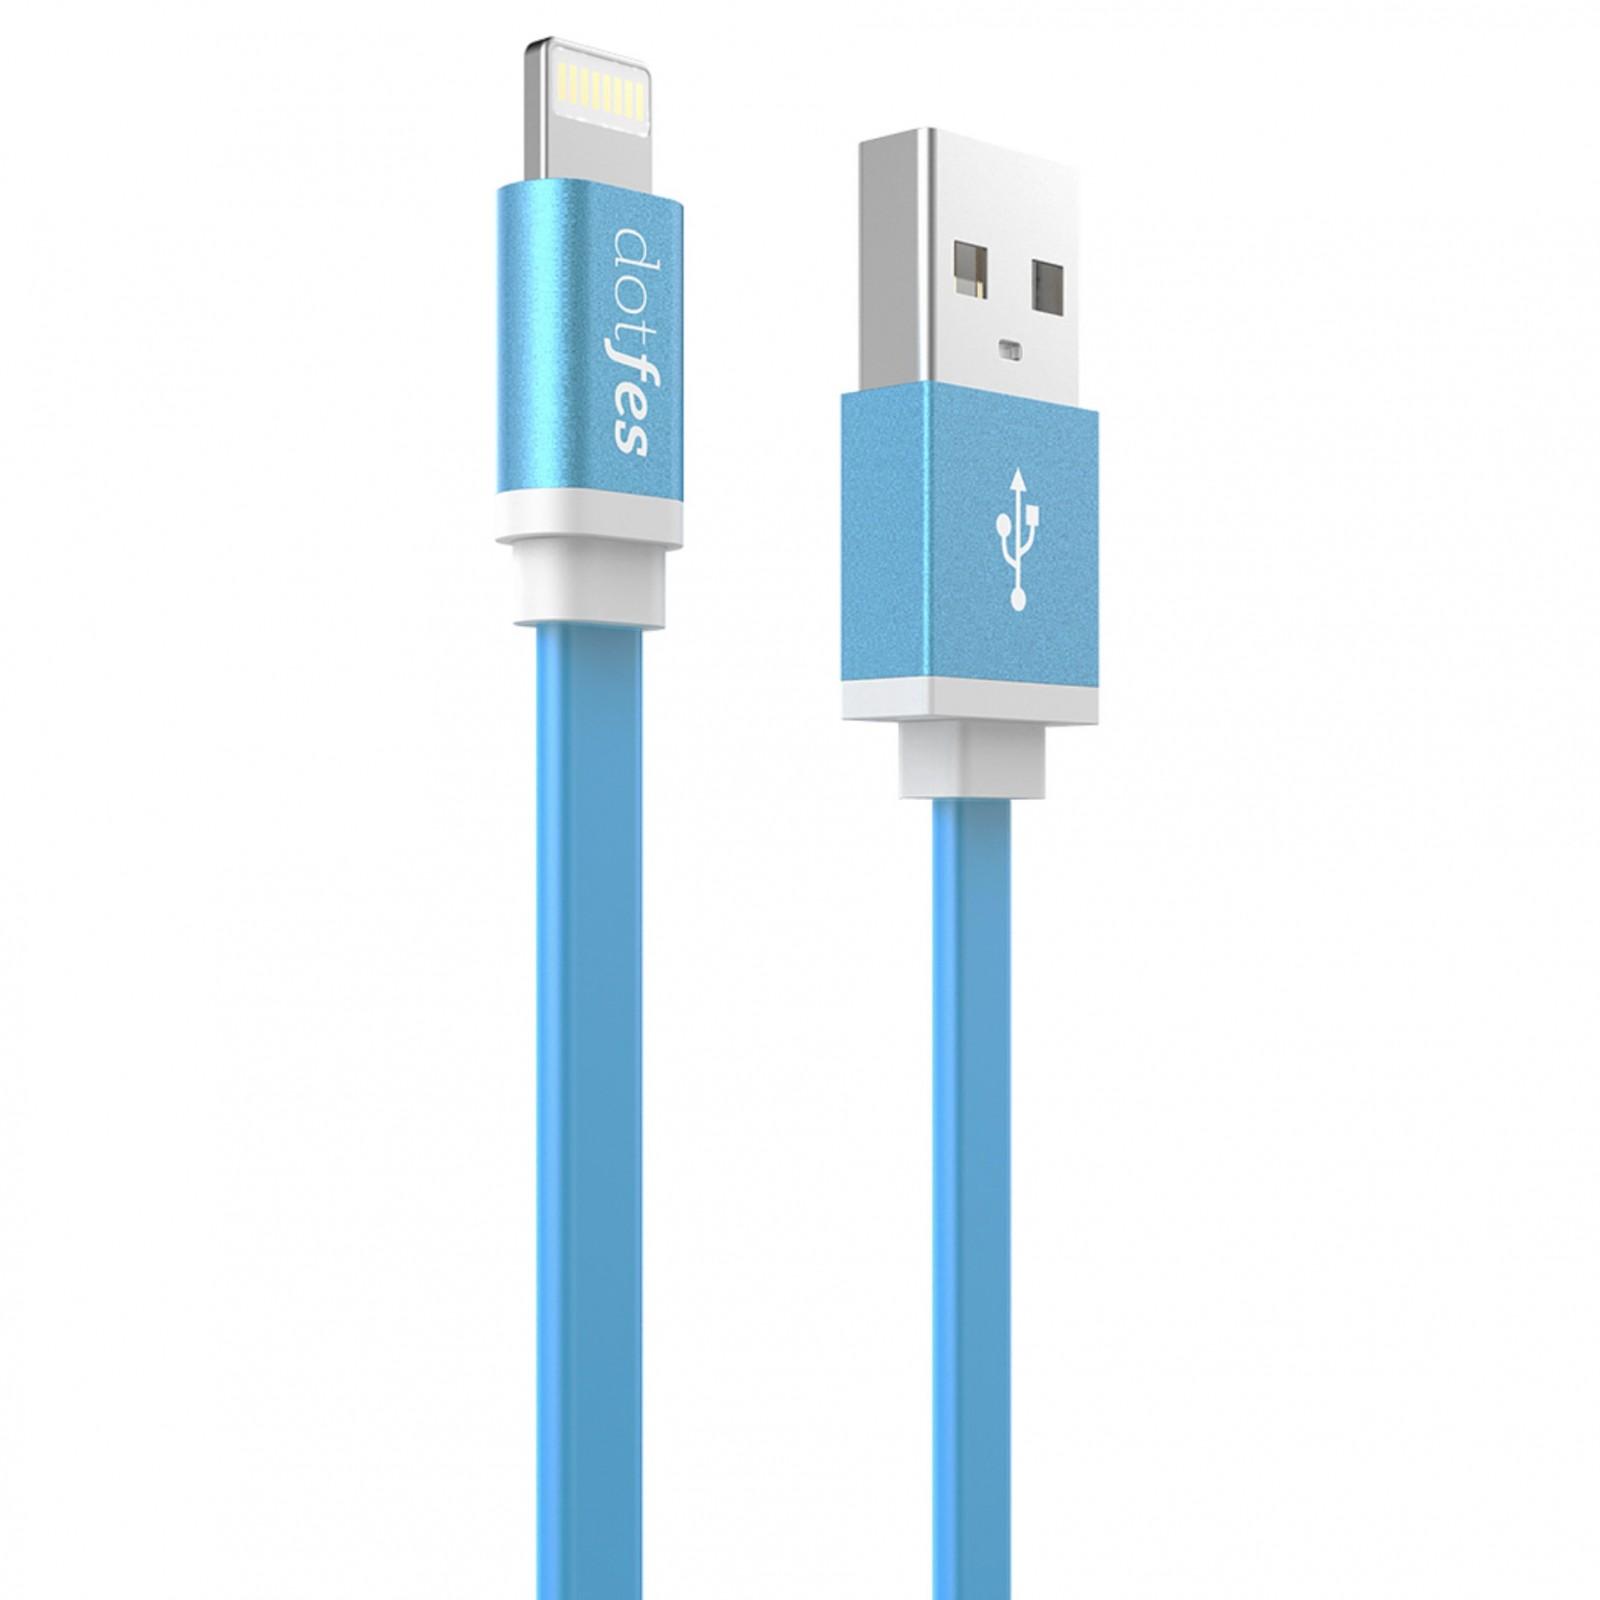 USB кабель Dotfes A05 Lightning (1m), blue аксессуар dotfes usb lightning mfi a01f 2 5a 1m grey 14601